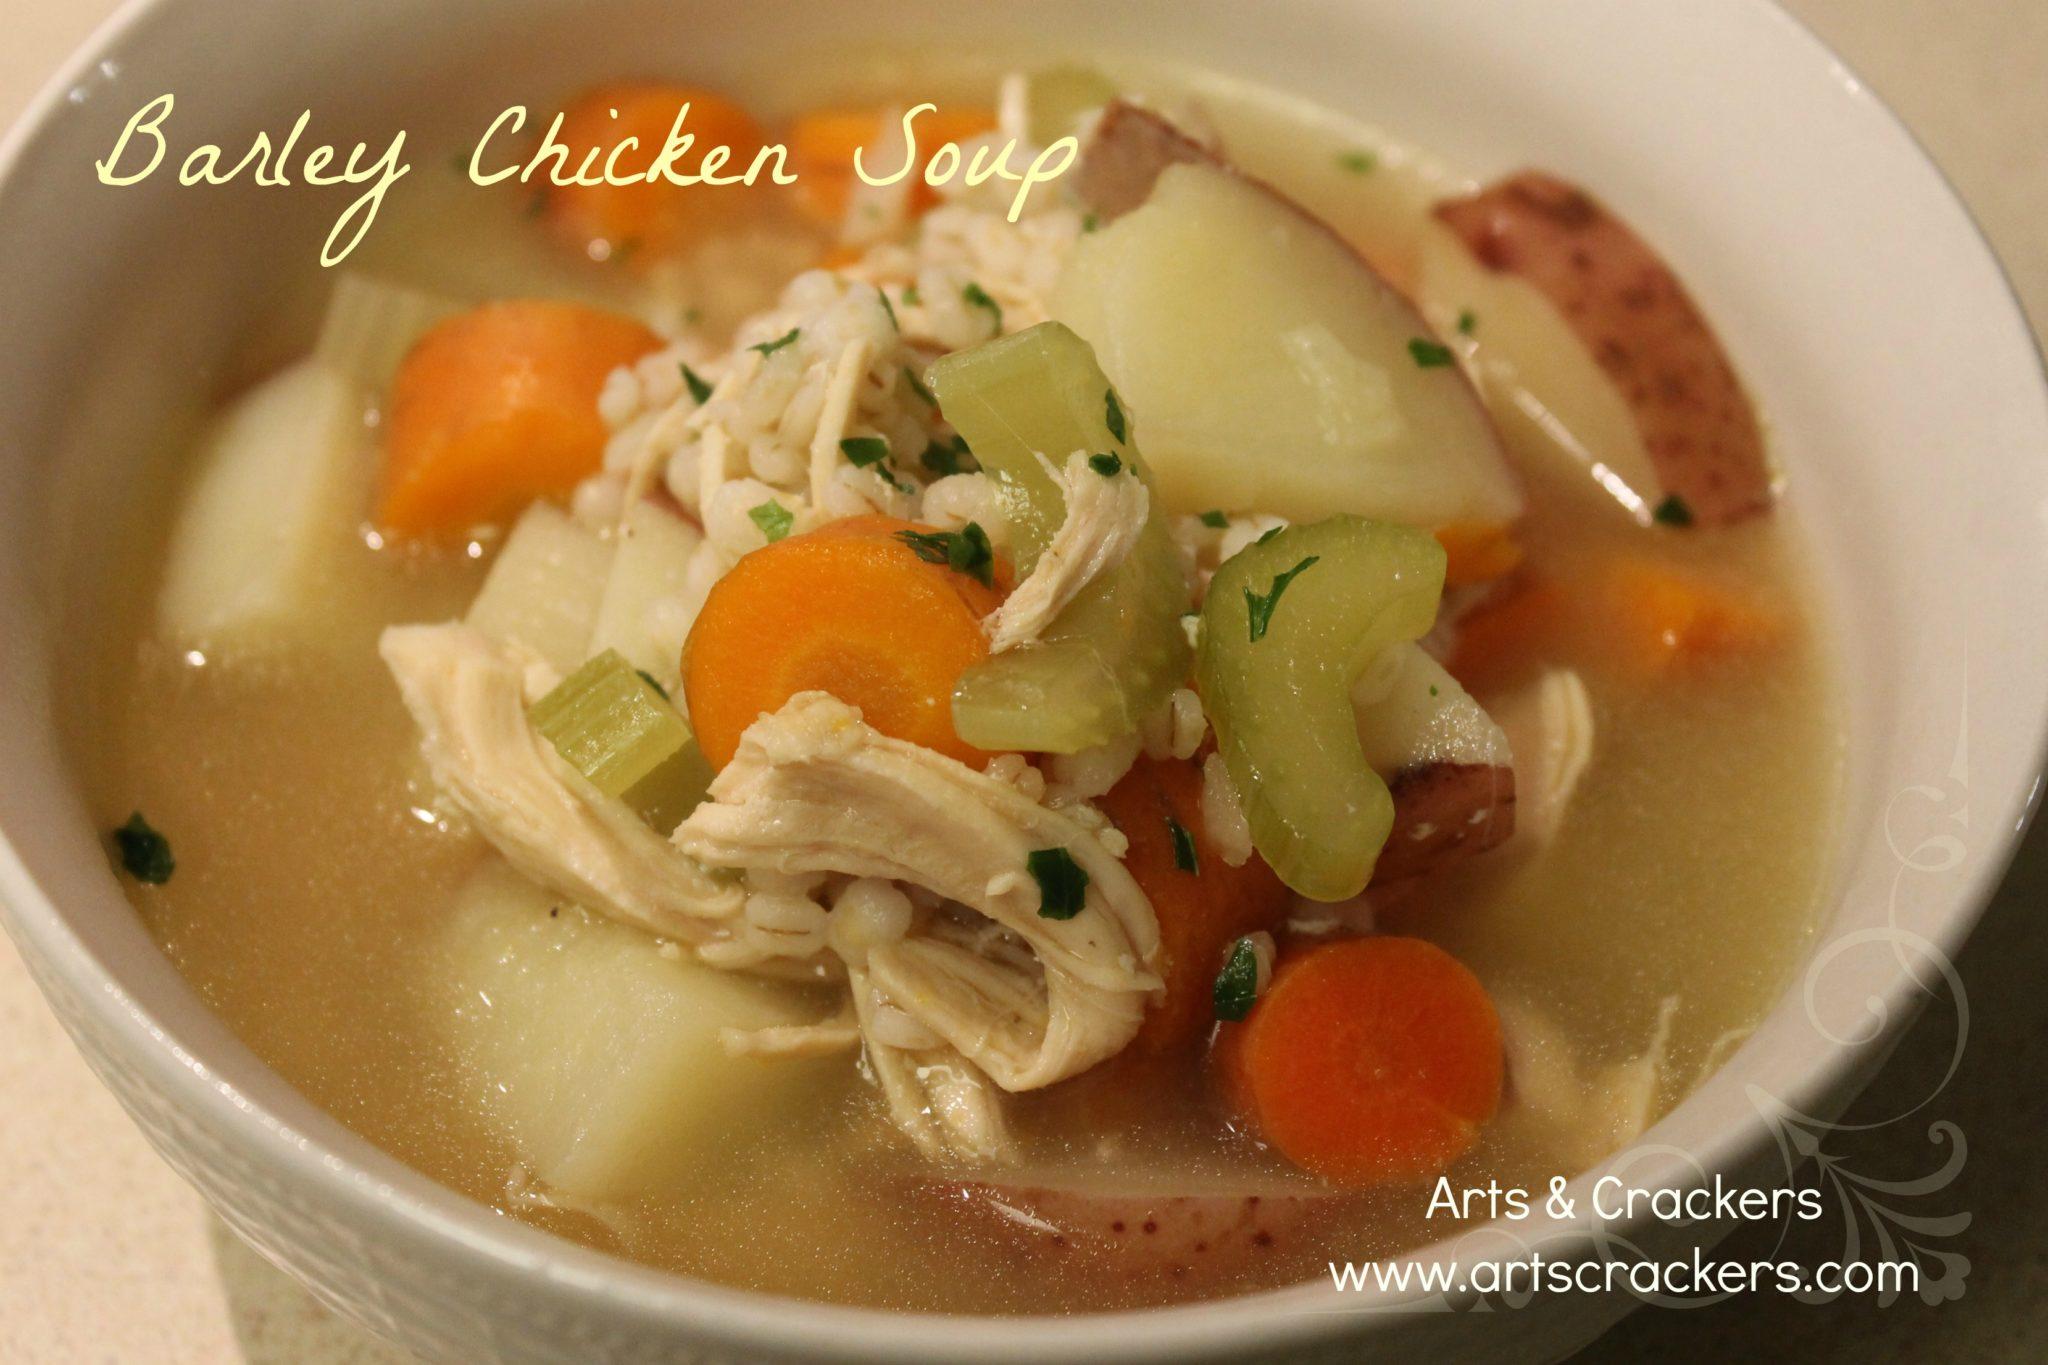 Basic Barley Chicken Soup *Recipe*